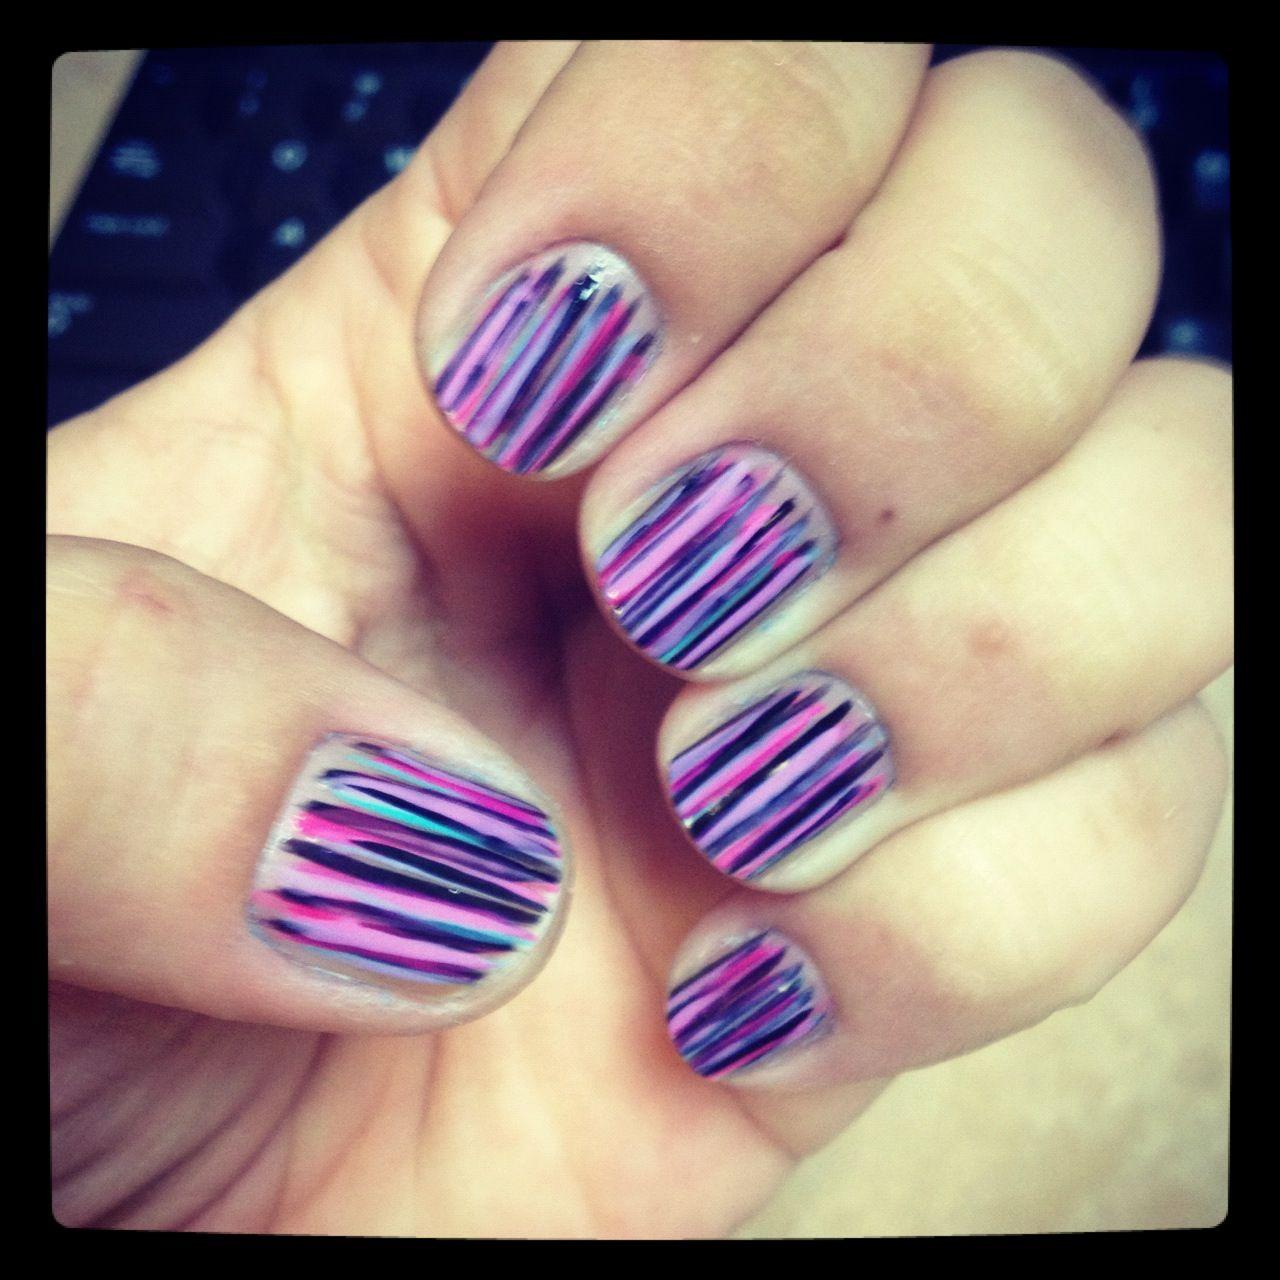 Fan Brush Nail Art | My Nail Designs | Pinterest | Fan brush nails ...